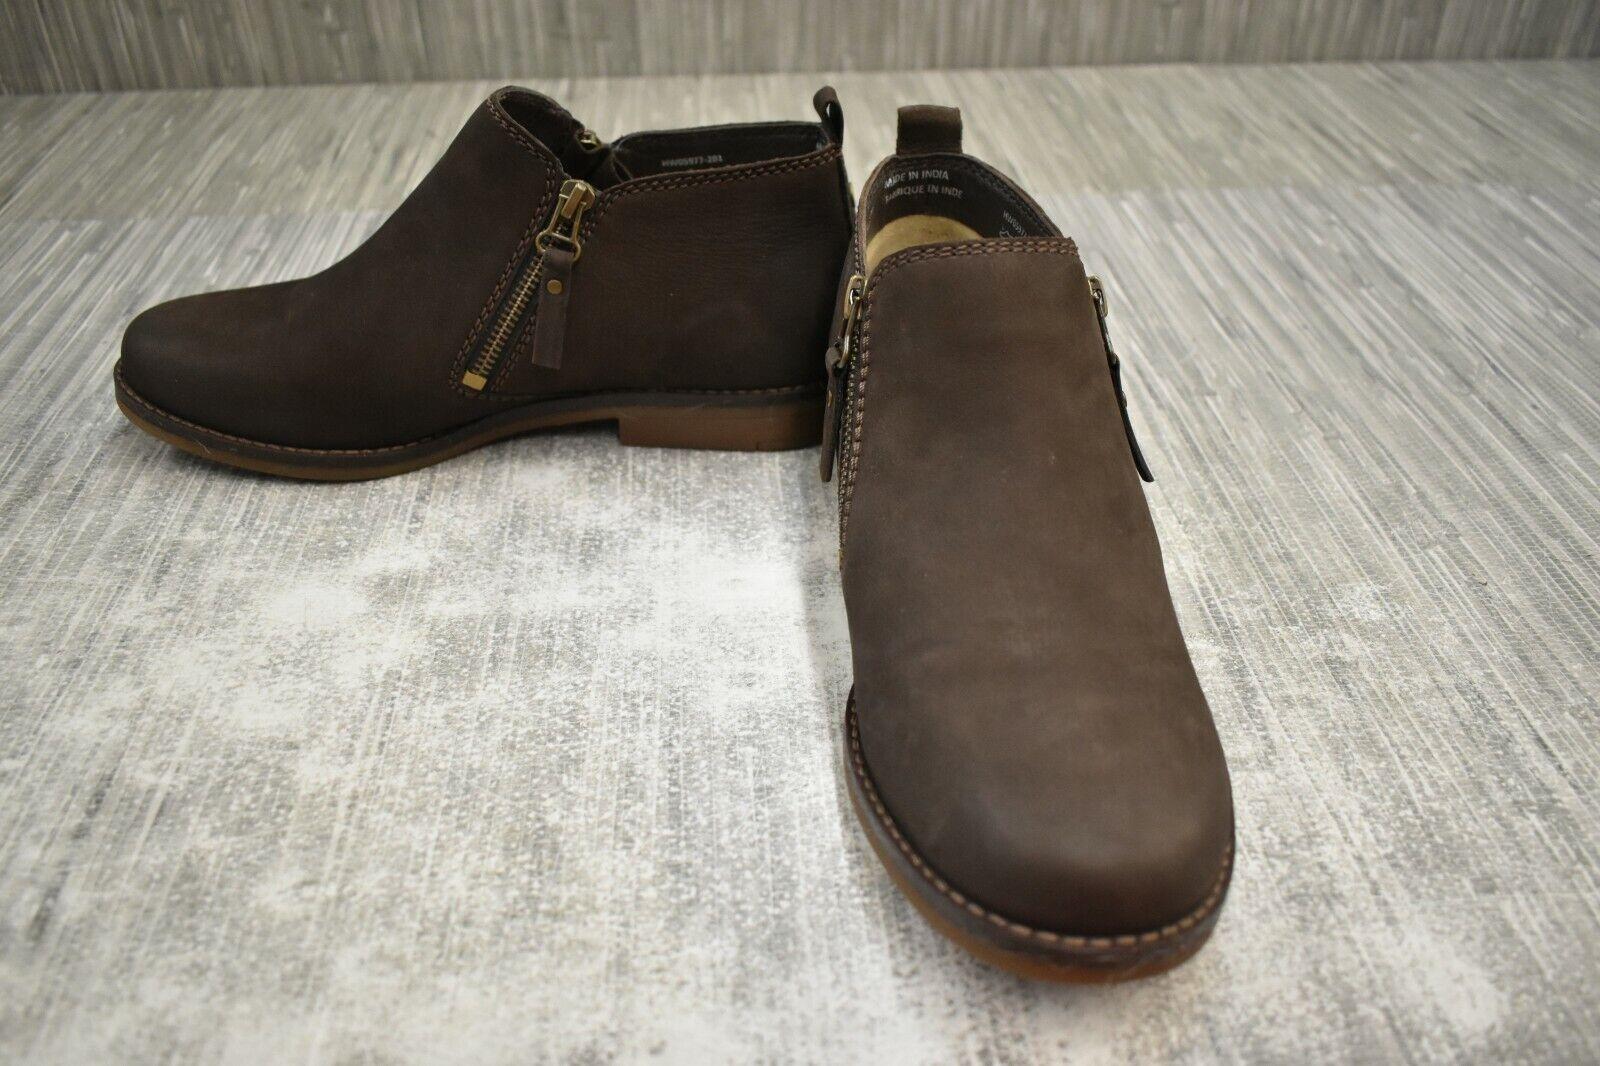 mazin cayto hw05977 201 ankle boots women